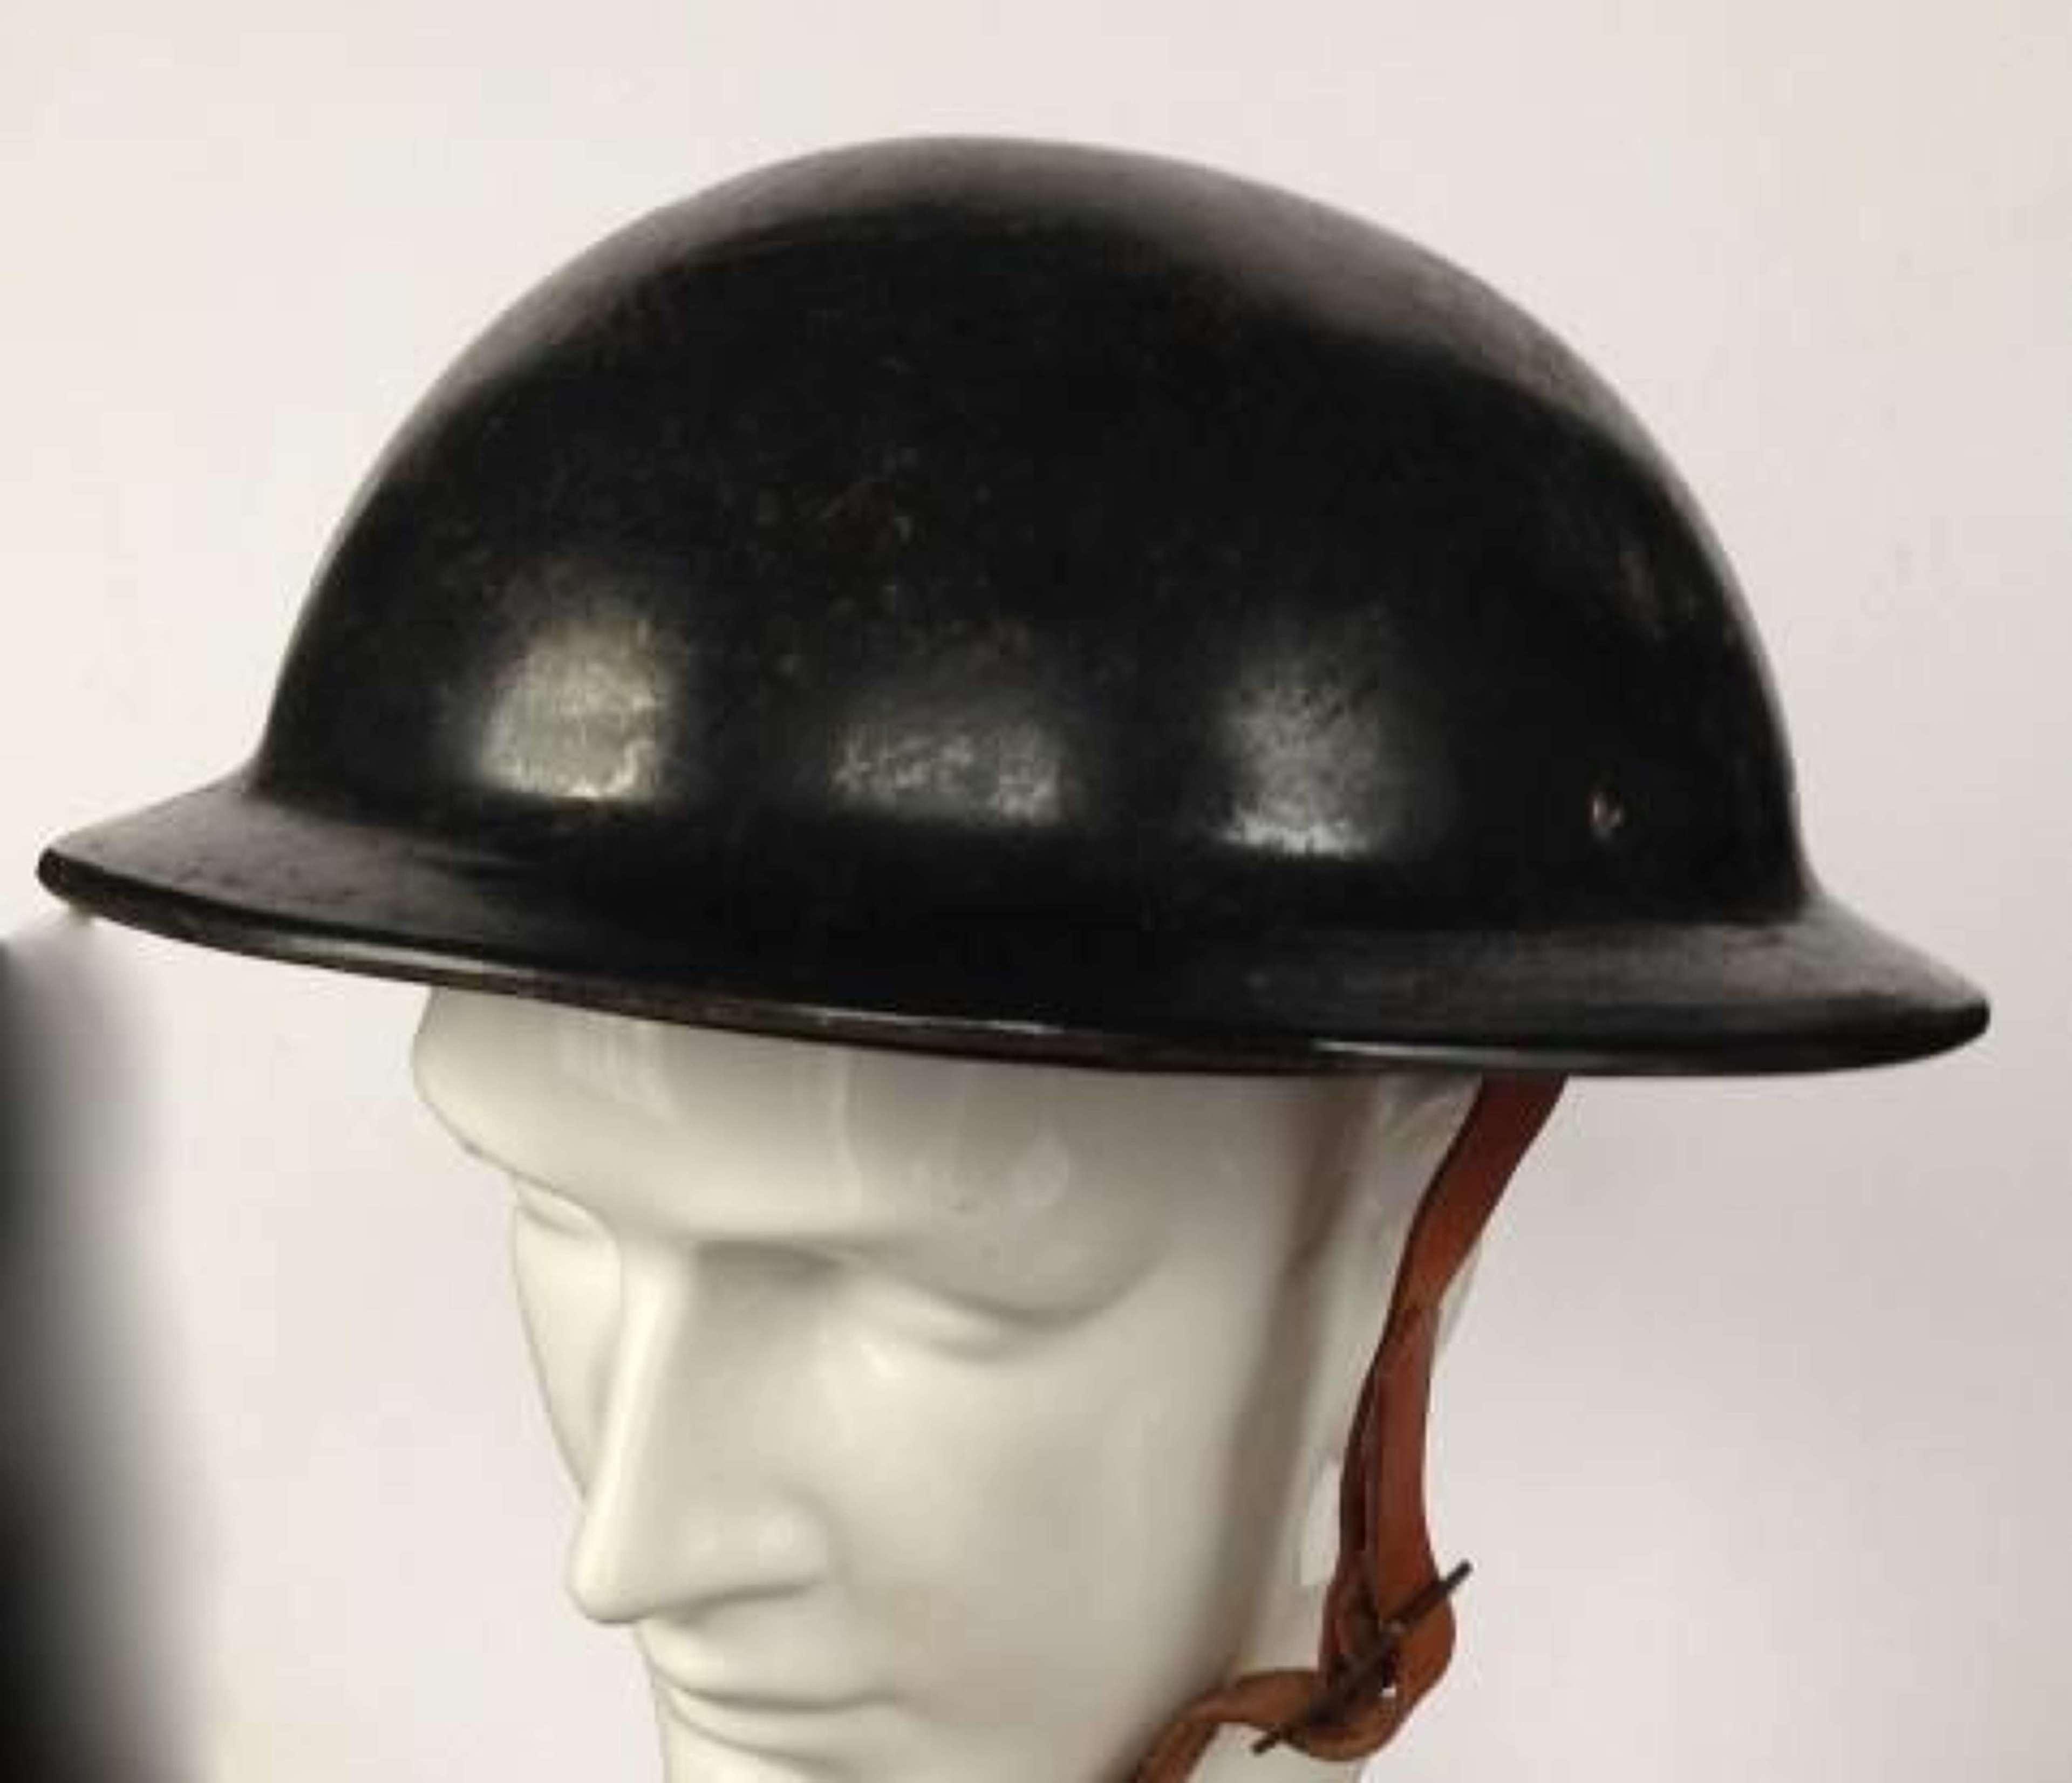 WW2 Home Front Civil Defence Fiber Helmet